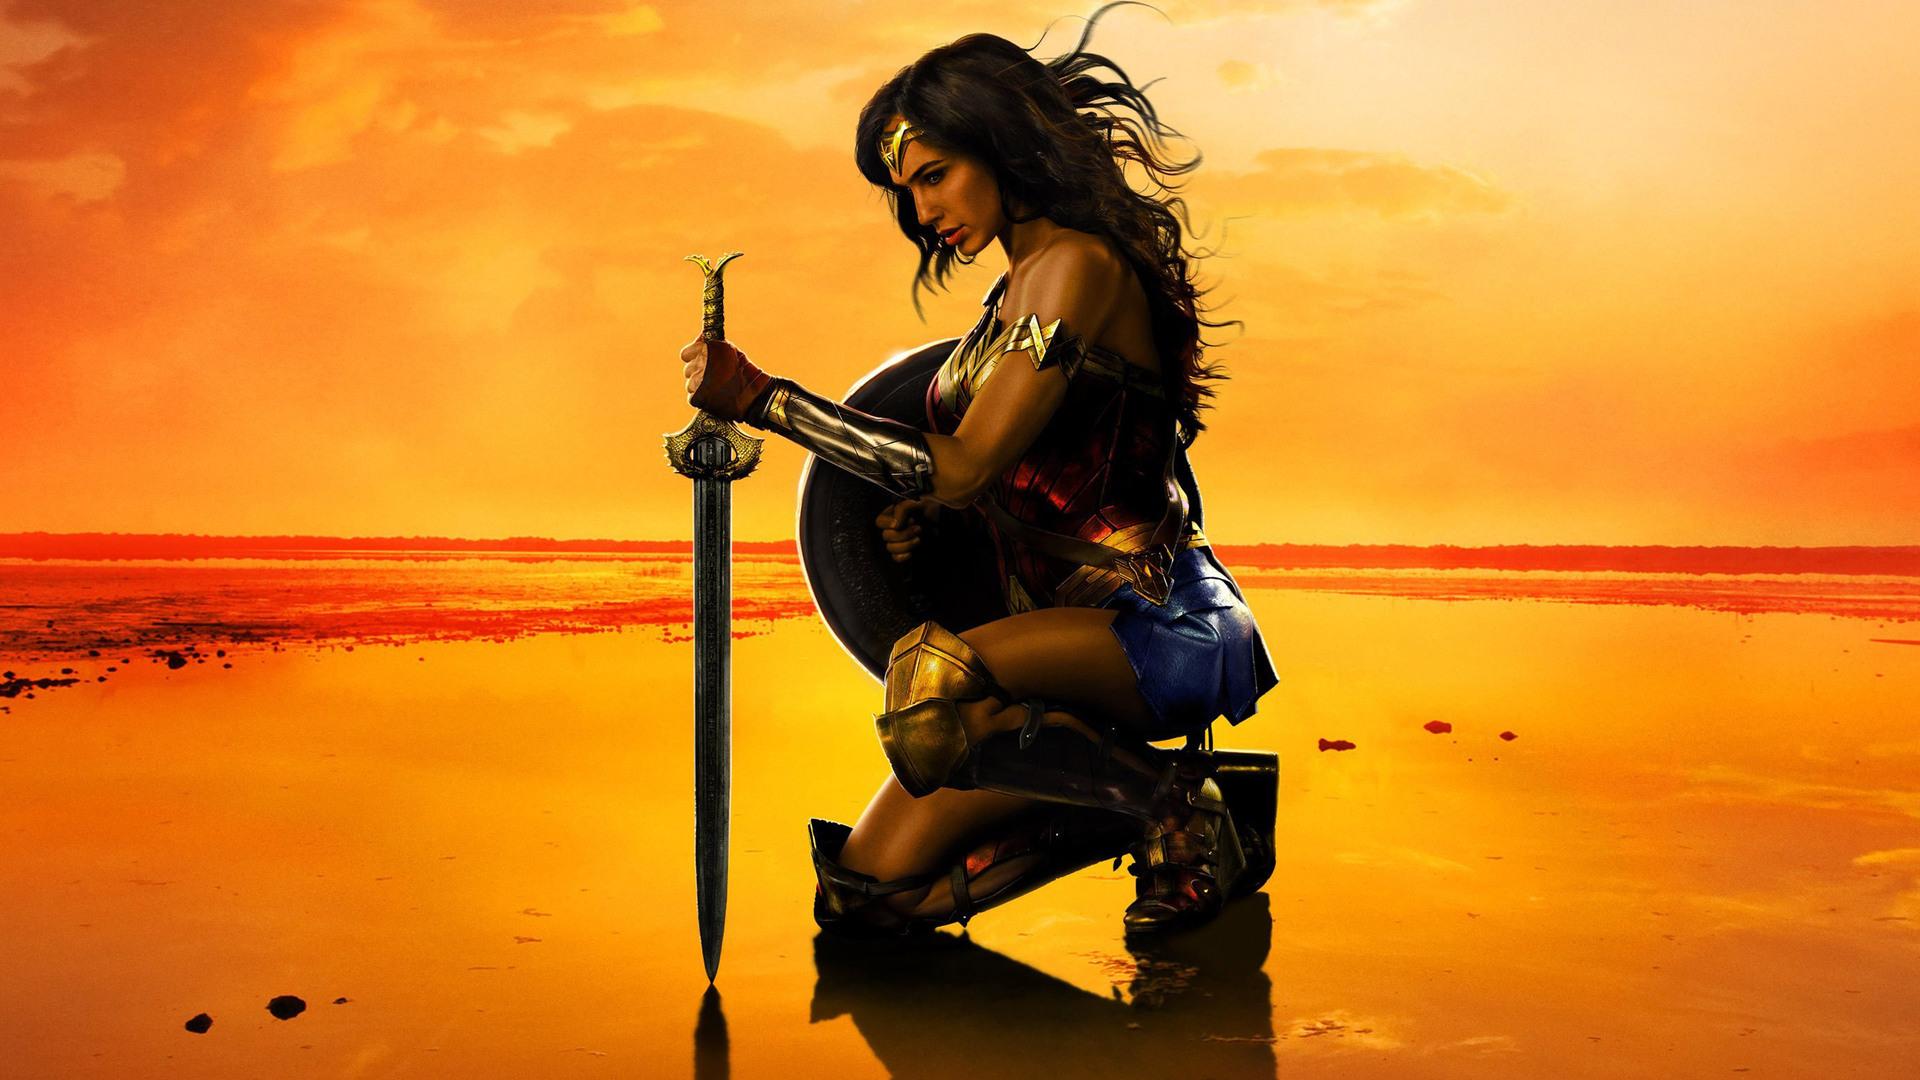 1920x1080 New Wonder Woman Poster Laptop Full HD 1080P HD ...